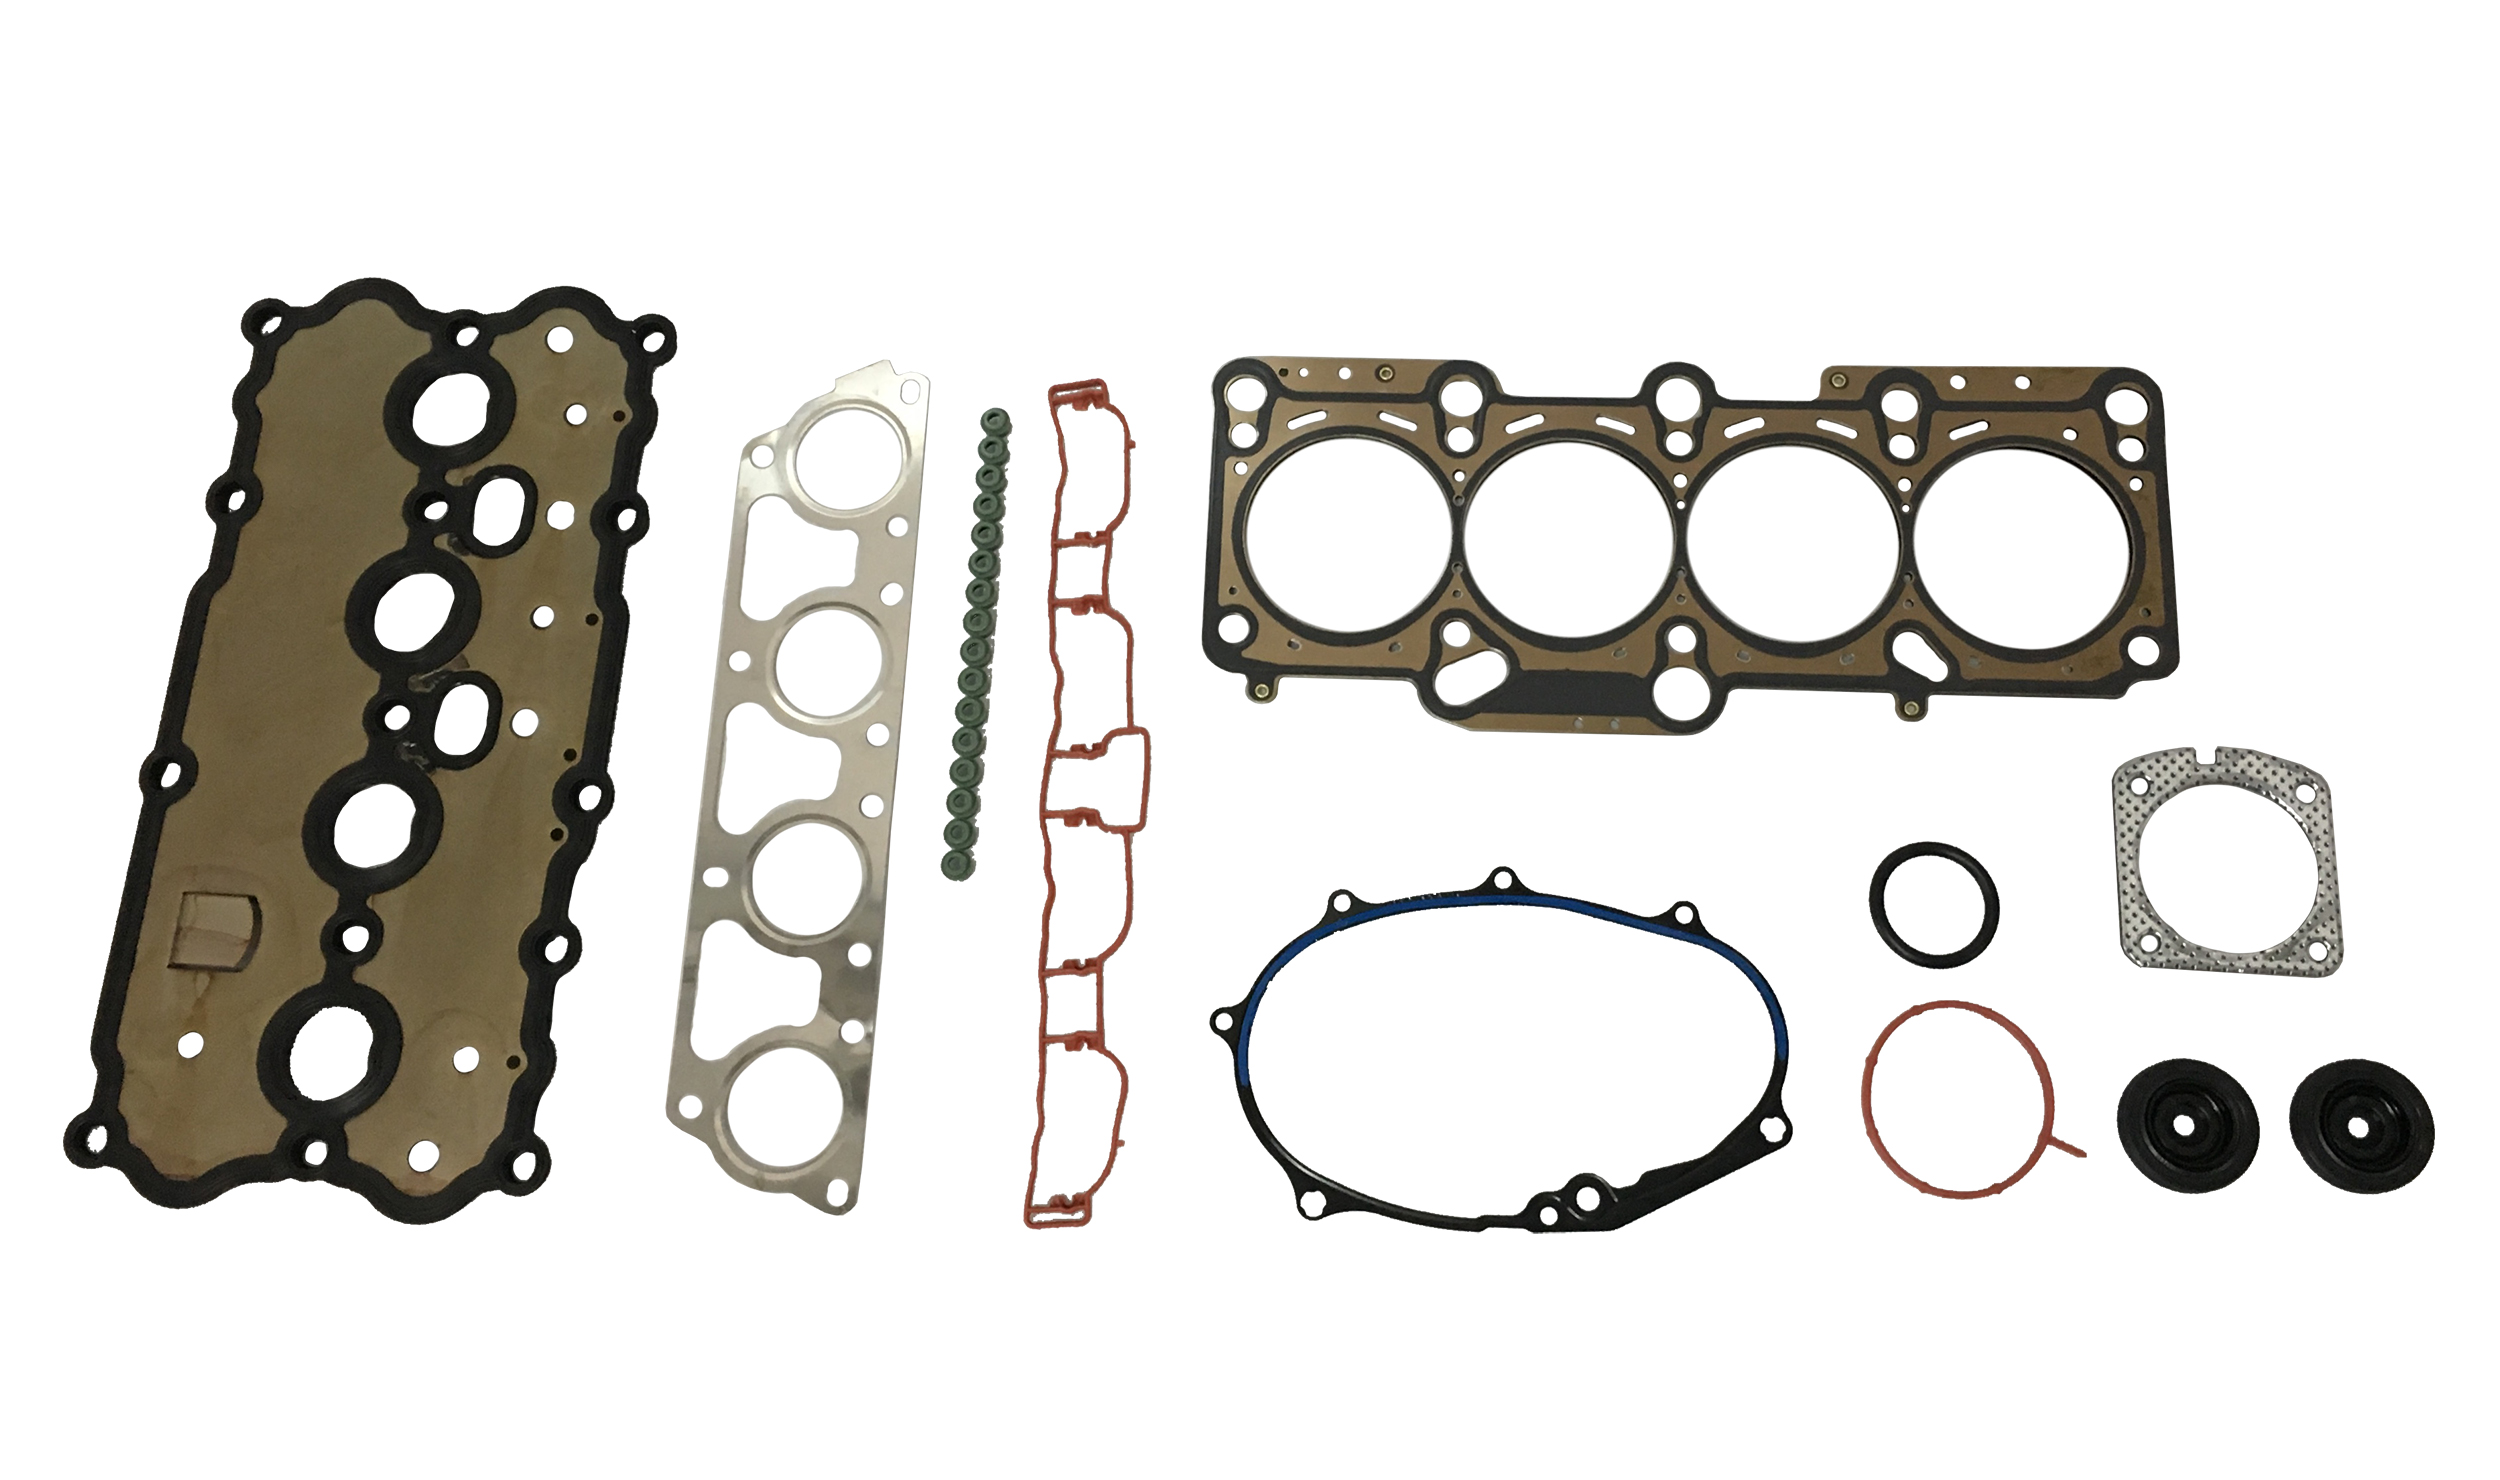 Zylinderkopfdichtsatz Zylinderkopfdichtung Audi 2,0 FSI BLR BVY 06D103383L NEU